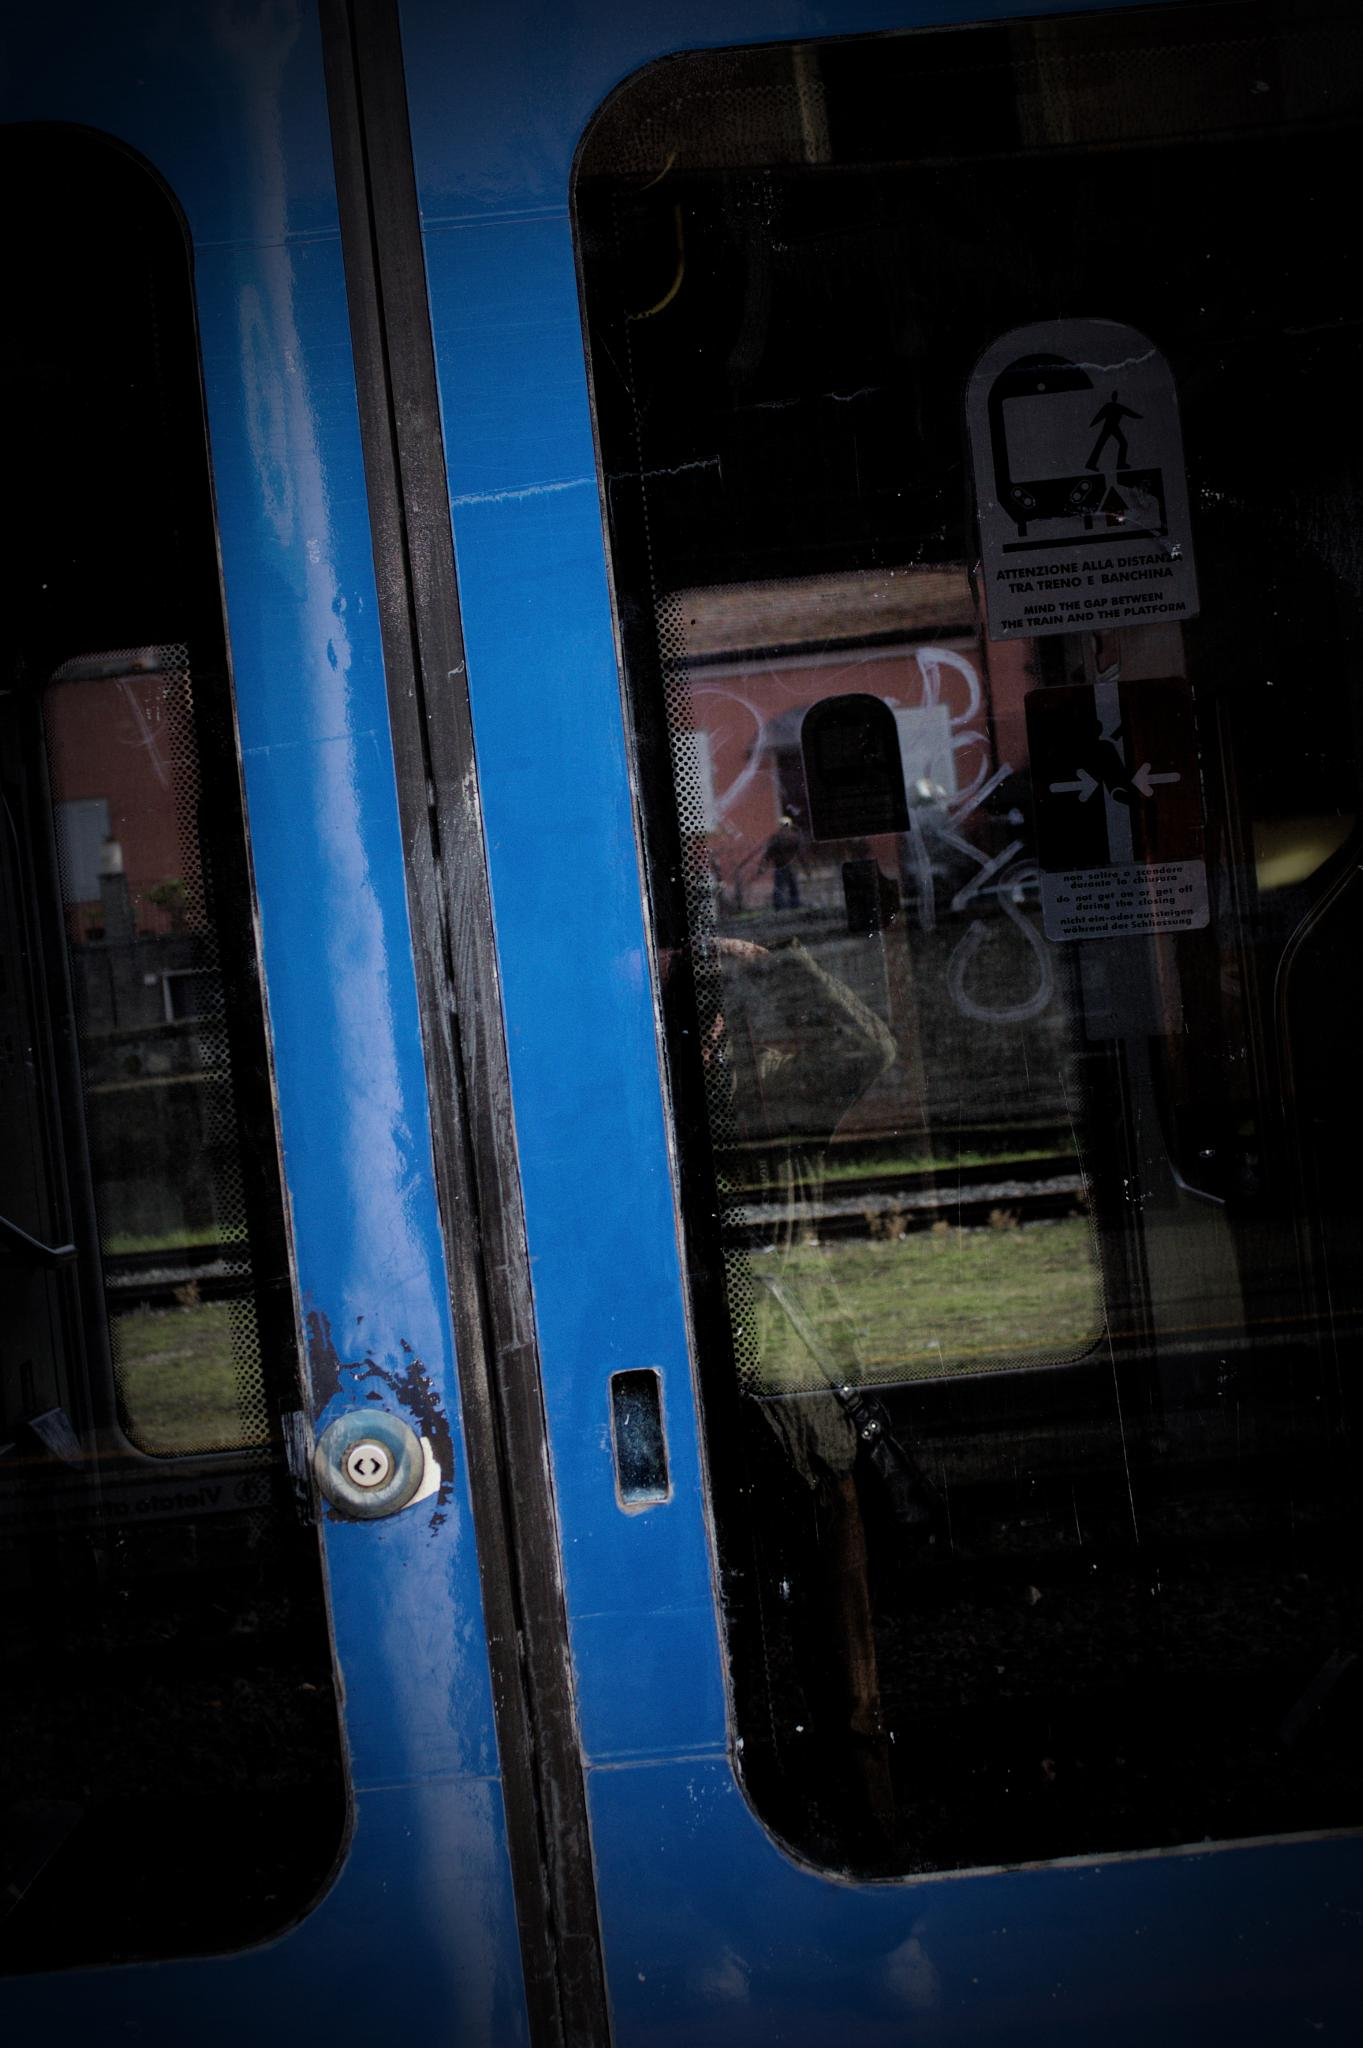 SLIDING DOORS by claudio cavaliere